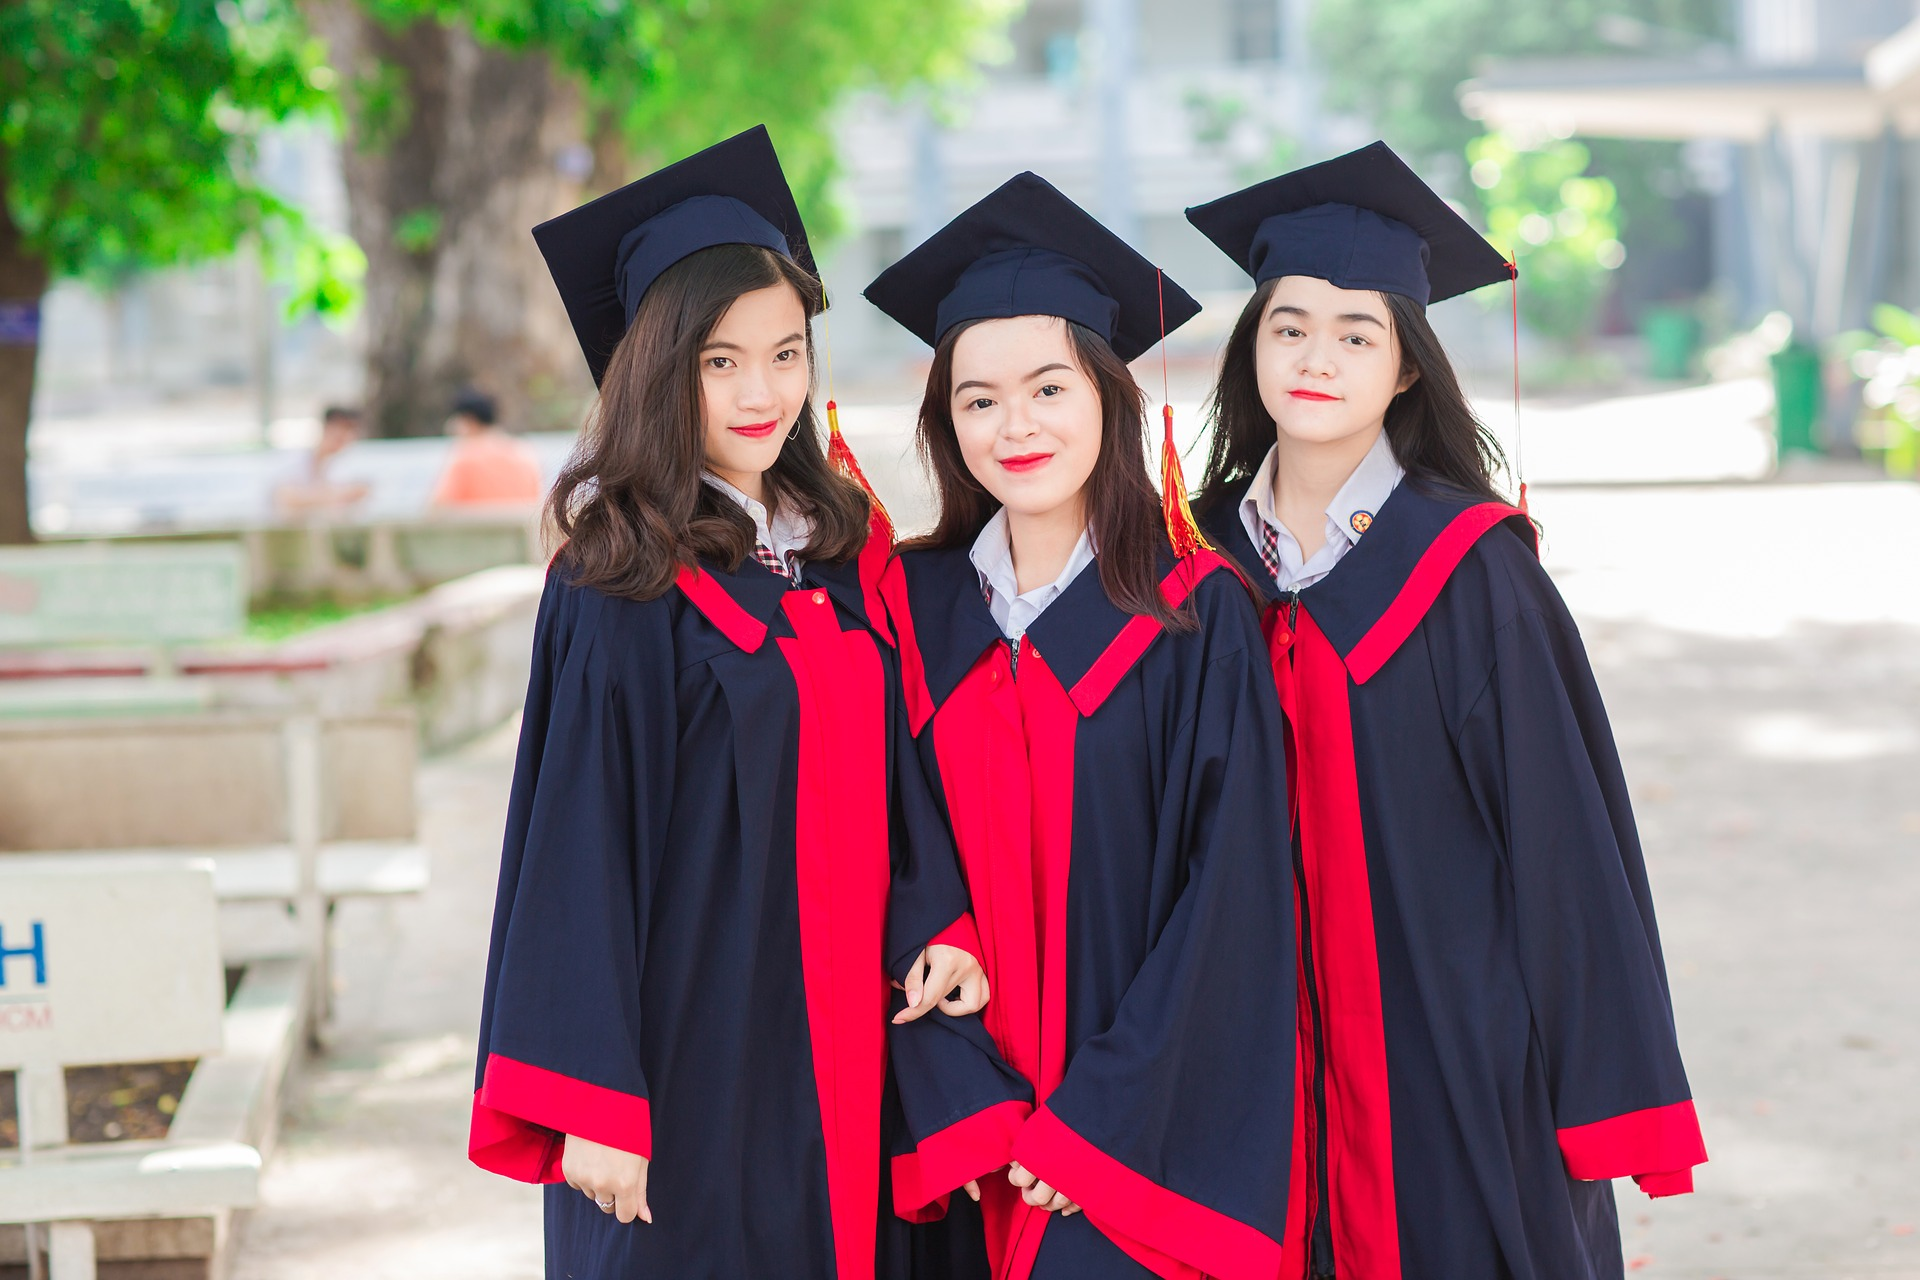 Top 15 Women Education Quotes - Empower Female Education Slogans